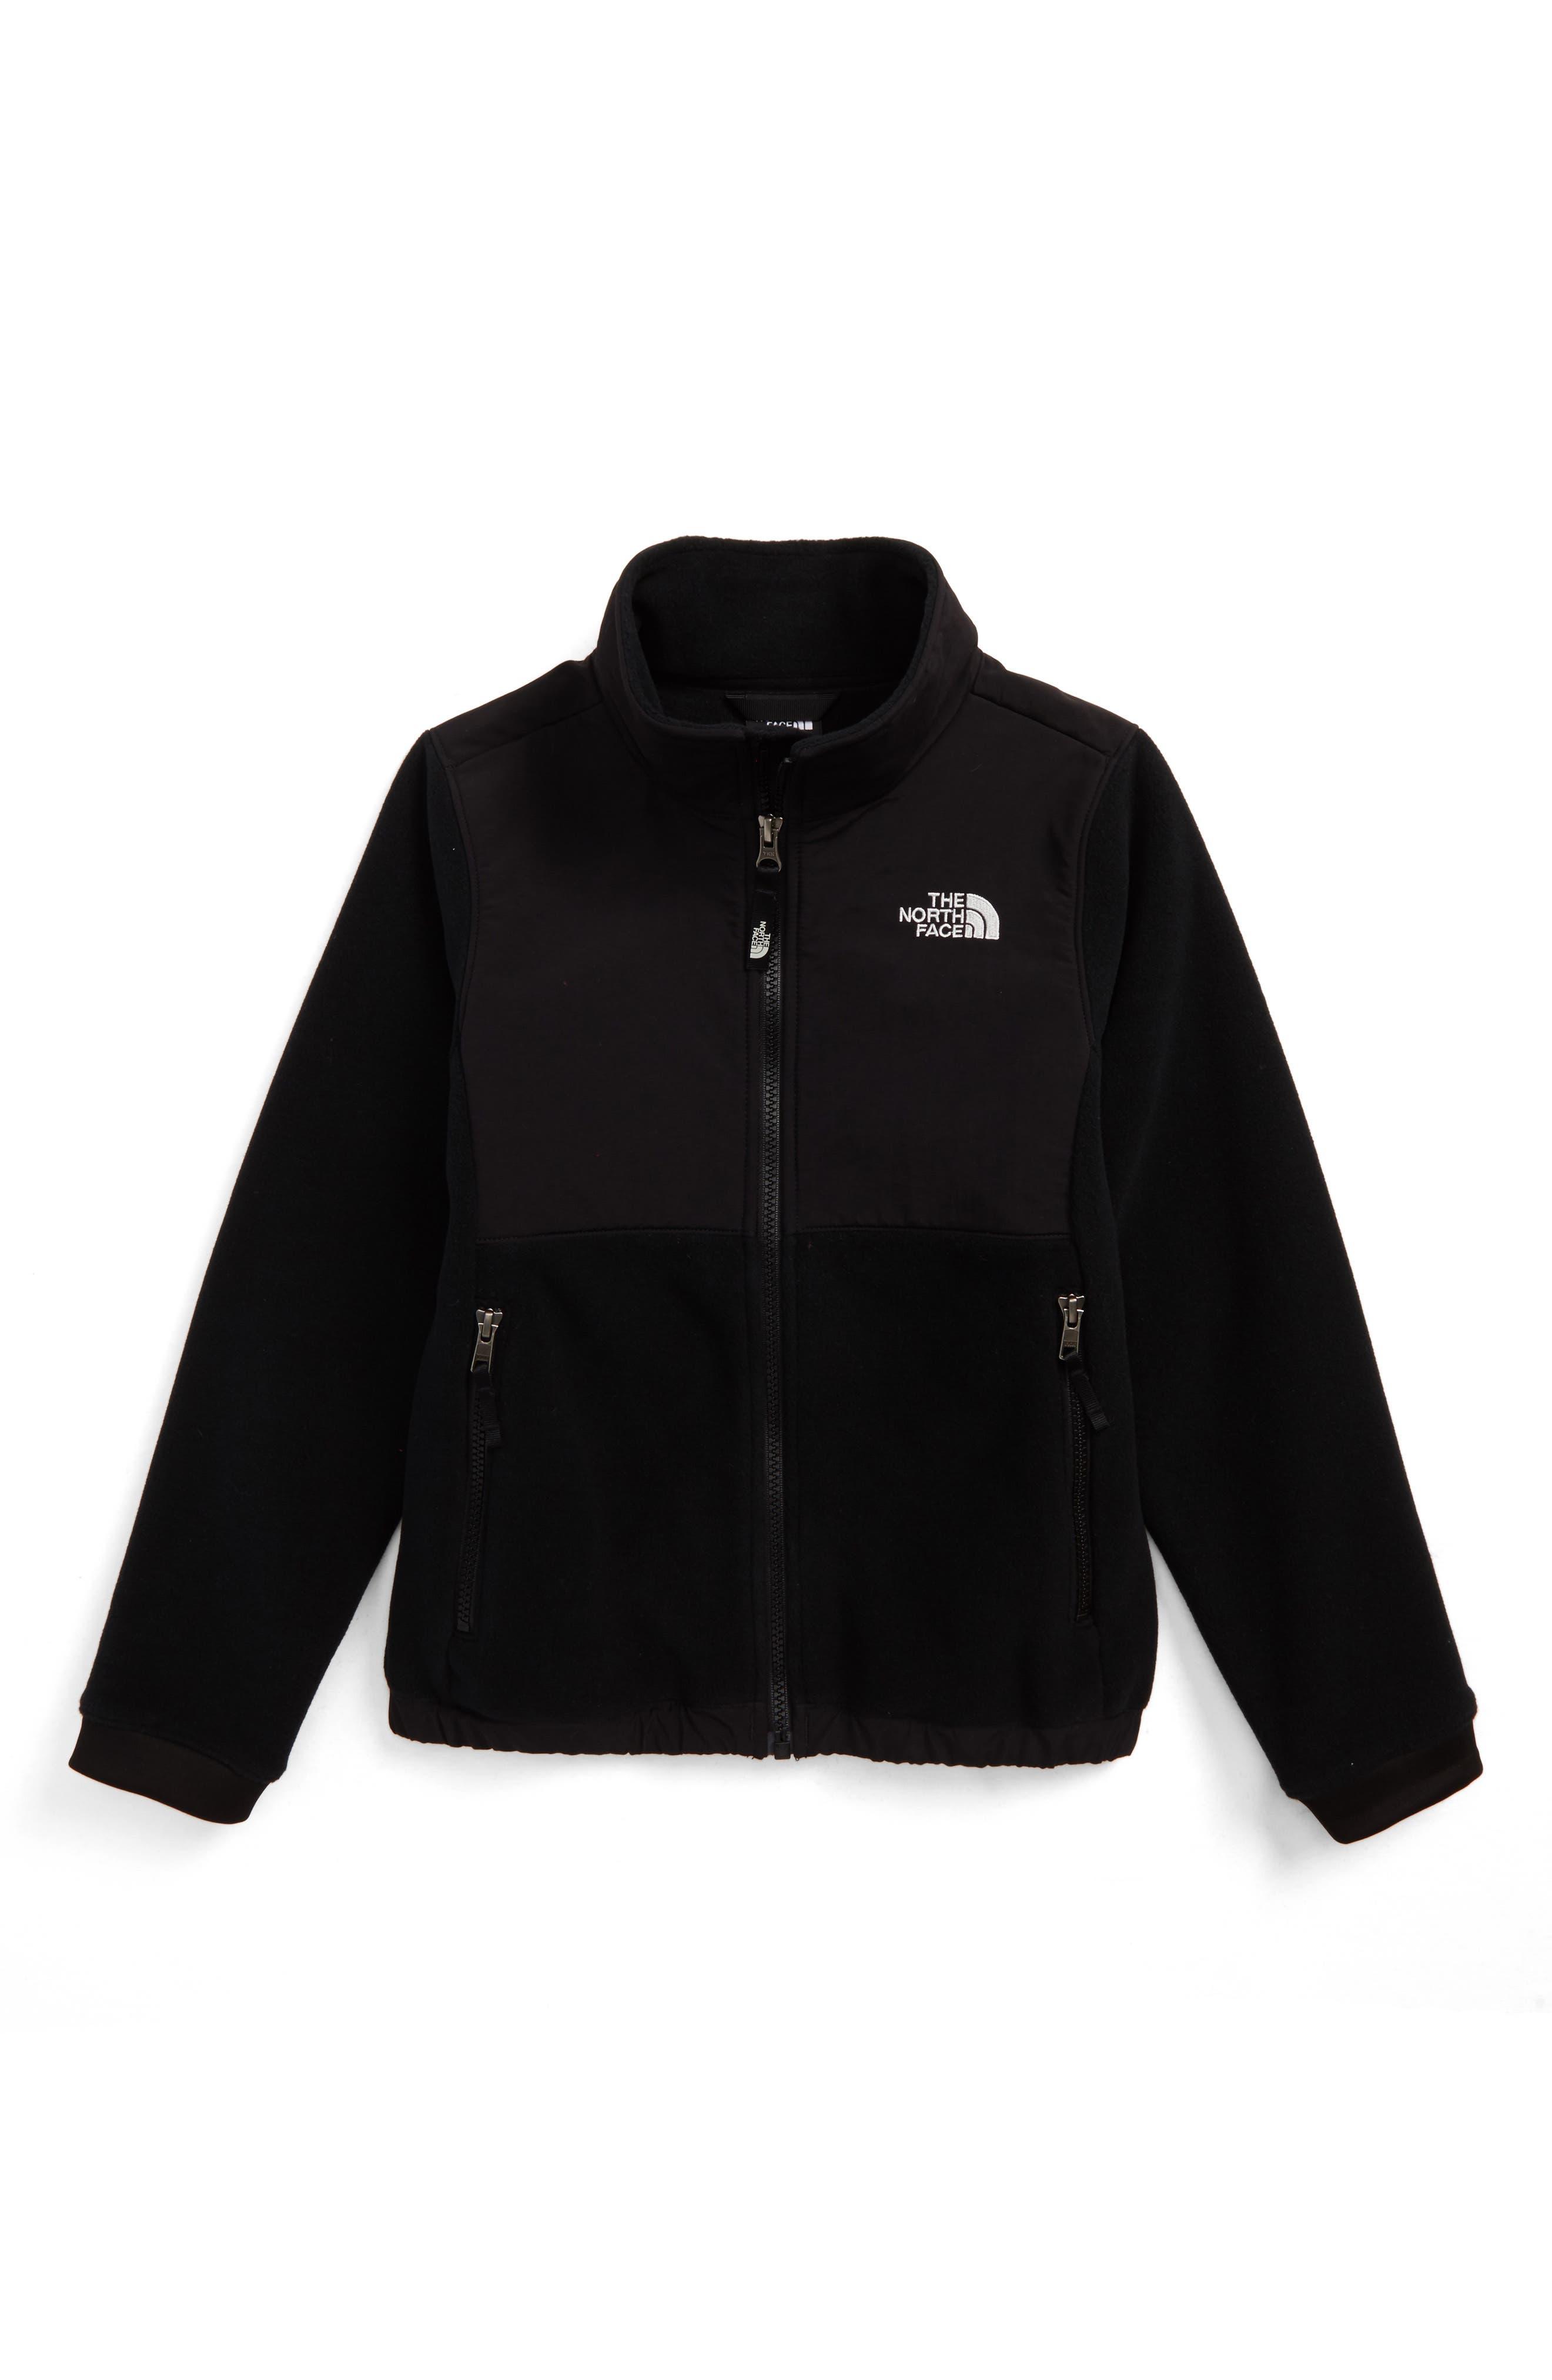 'Denali' Thermal Jacket,                         Main,                         color, Tnf Black